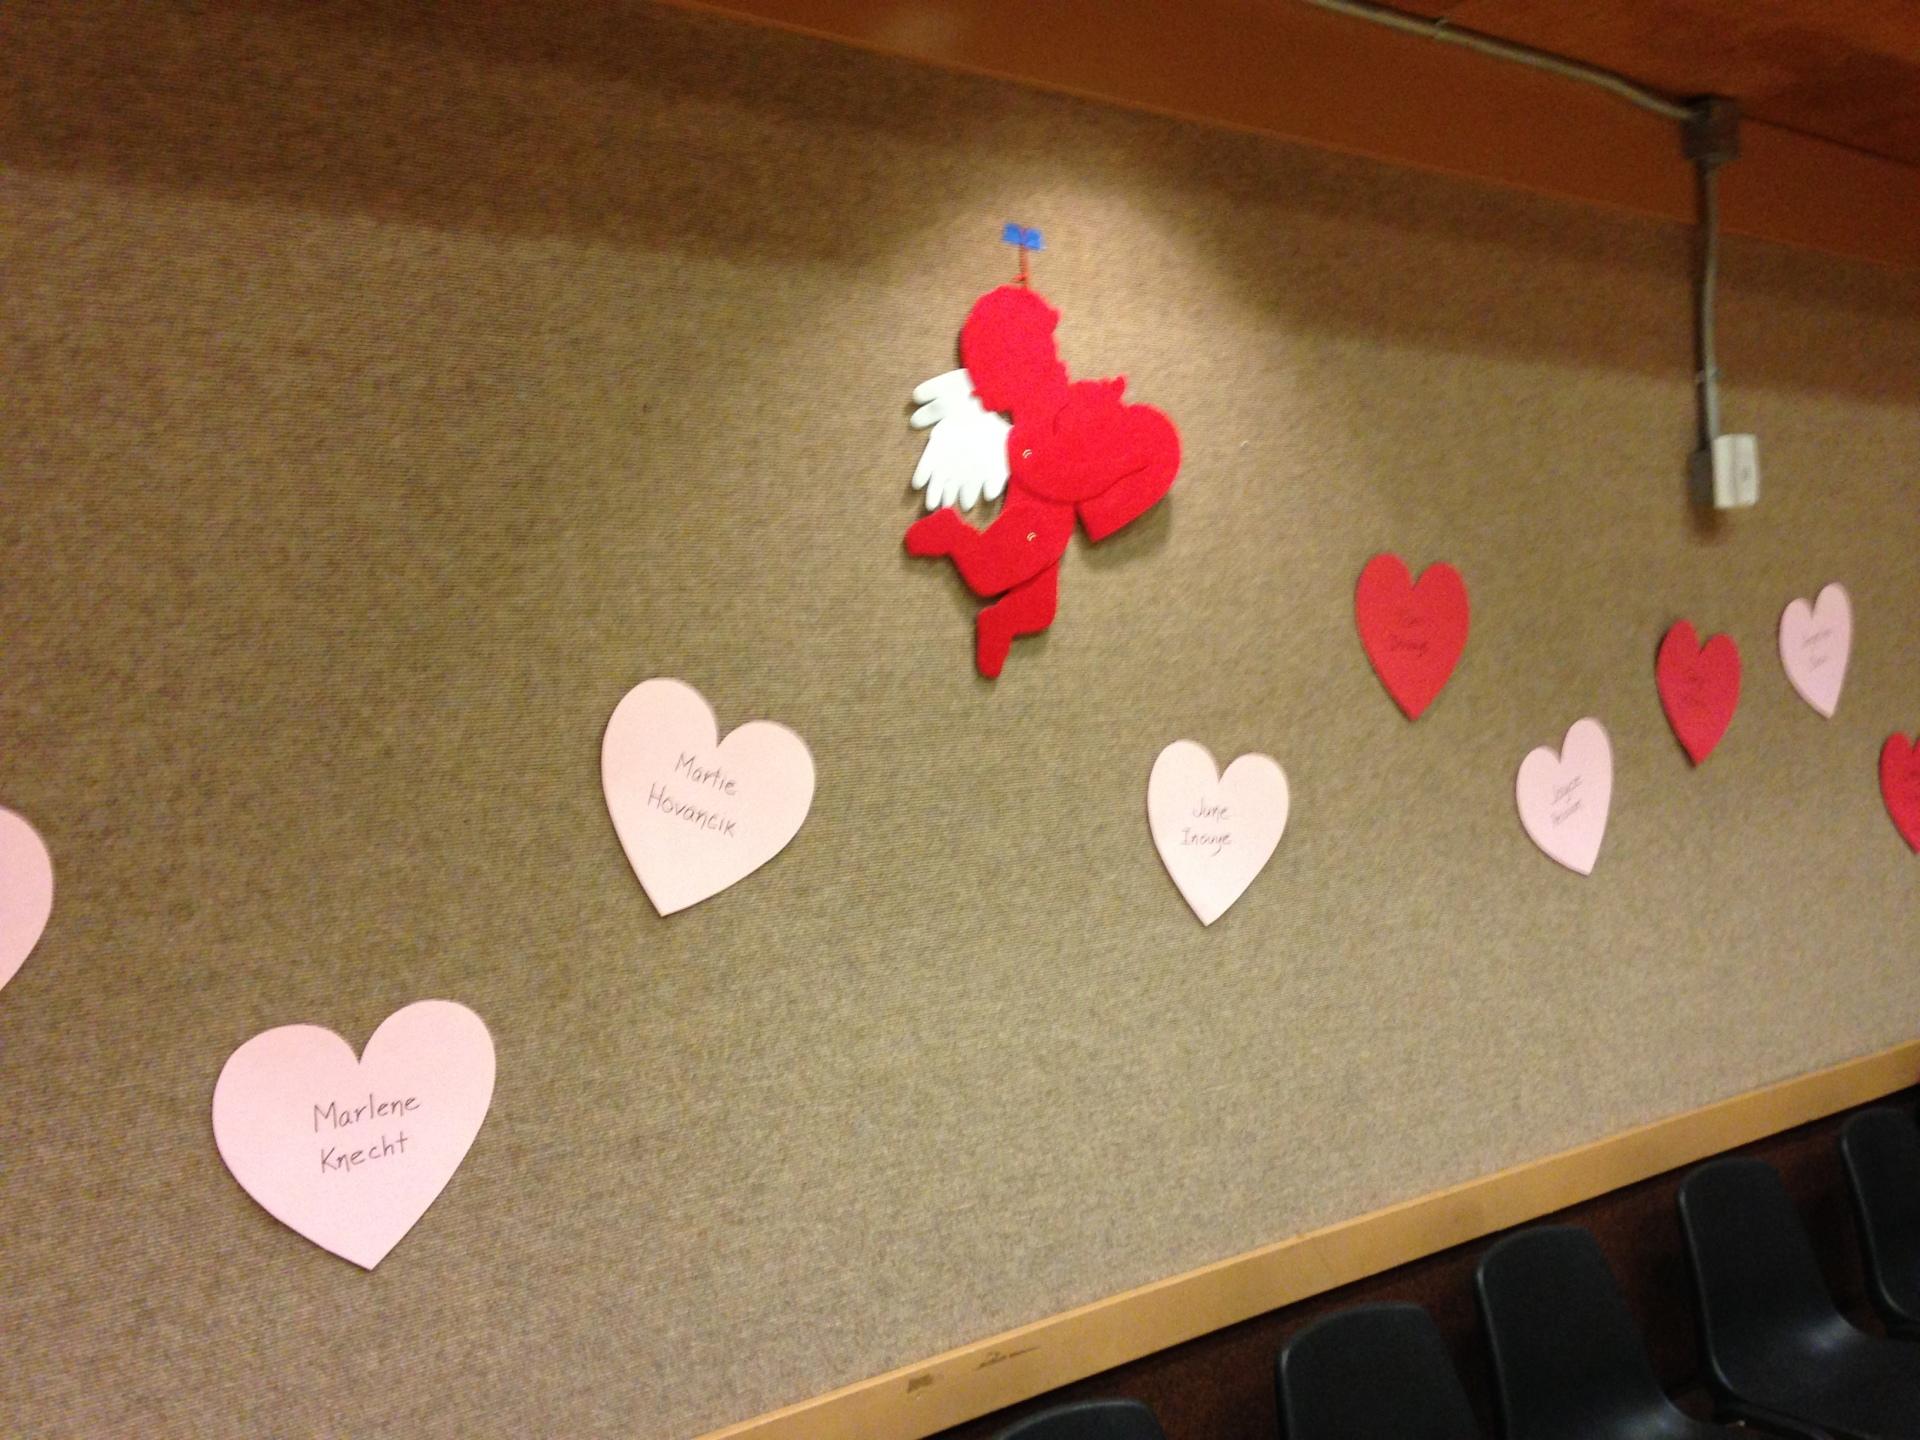 Members Hearts